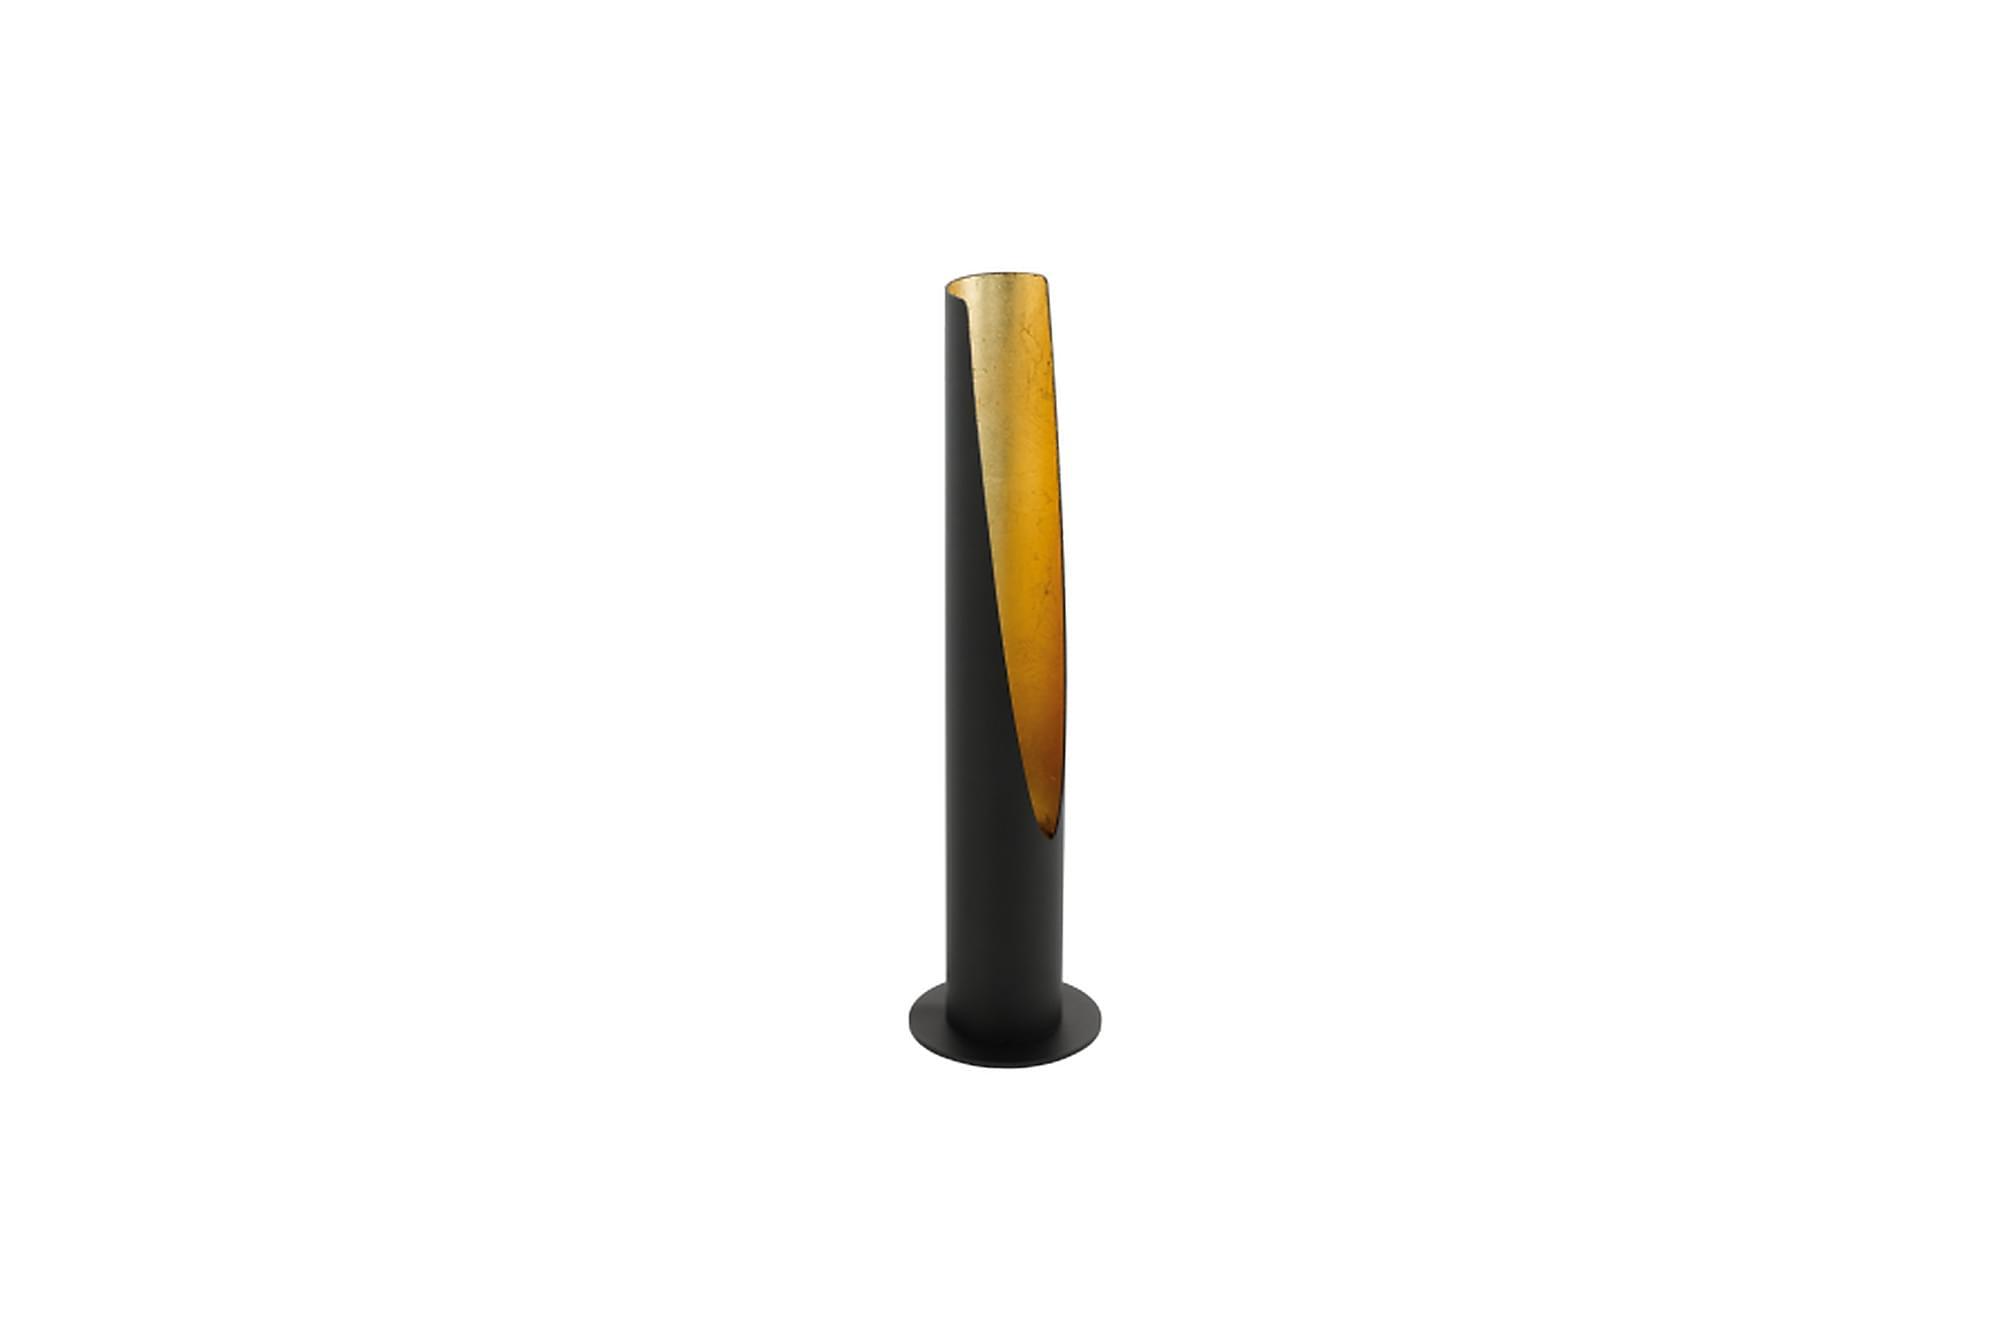 BARBOTTO Bordslampa 10 Rund LED Svart/Guld, Bordslampor